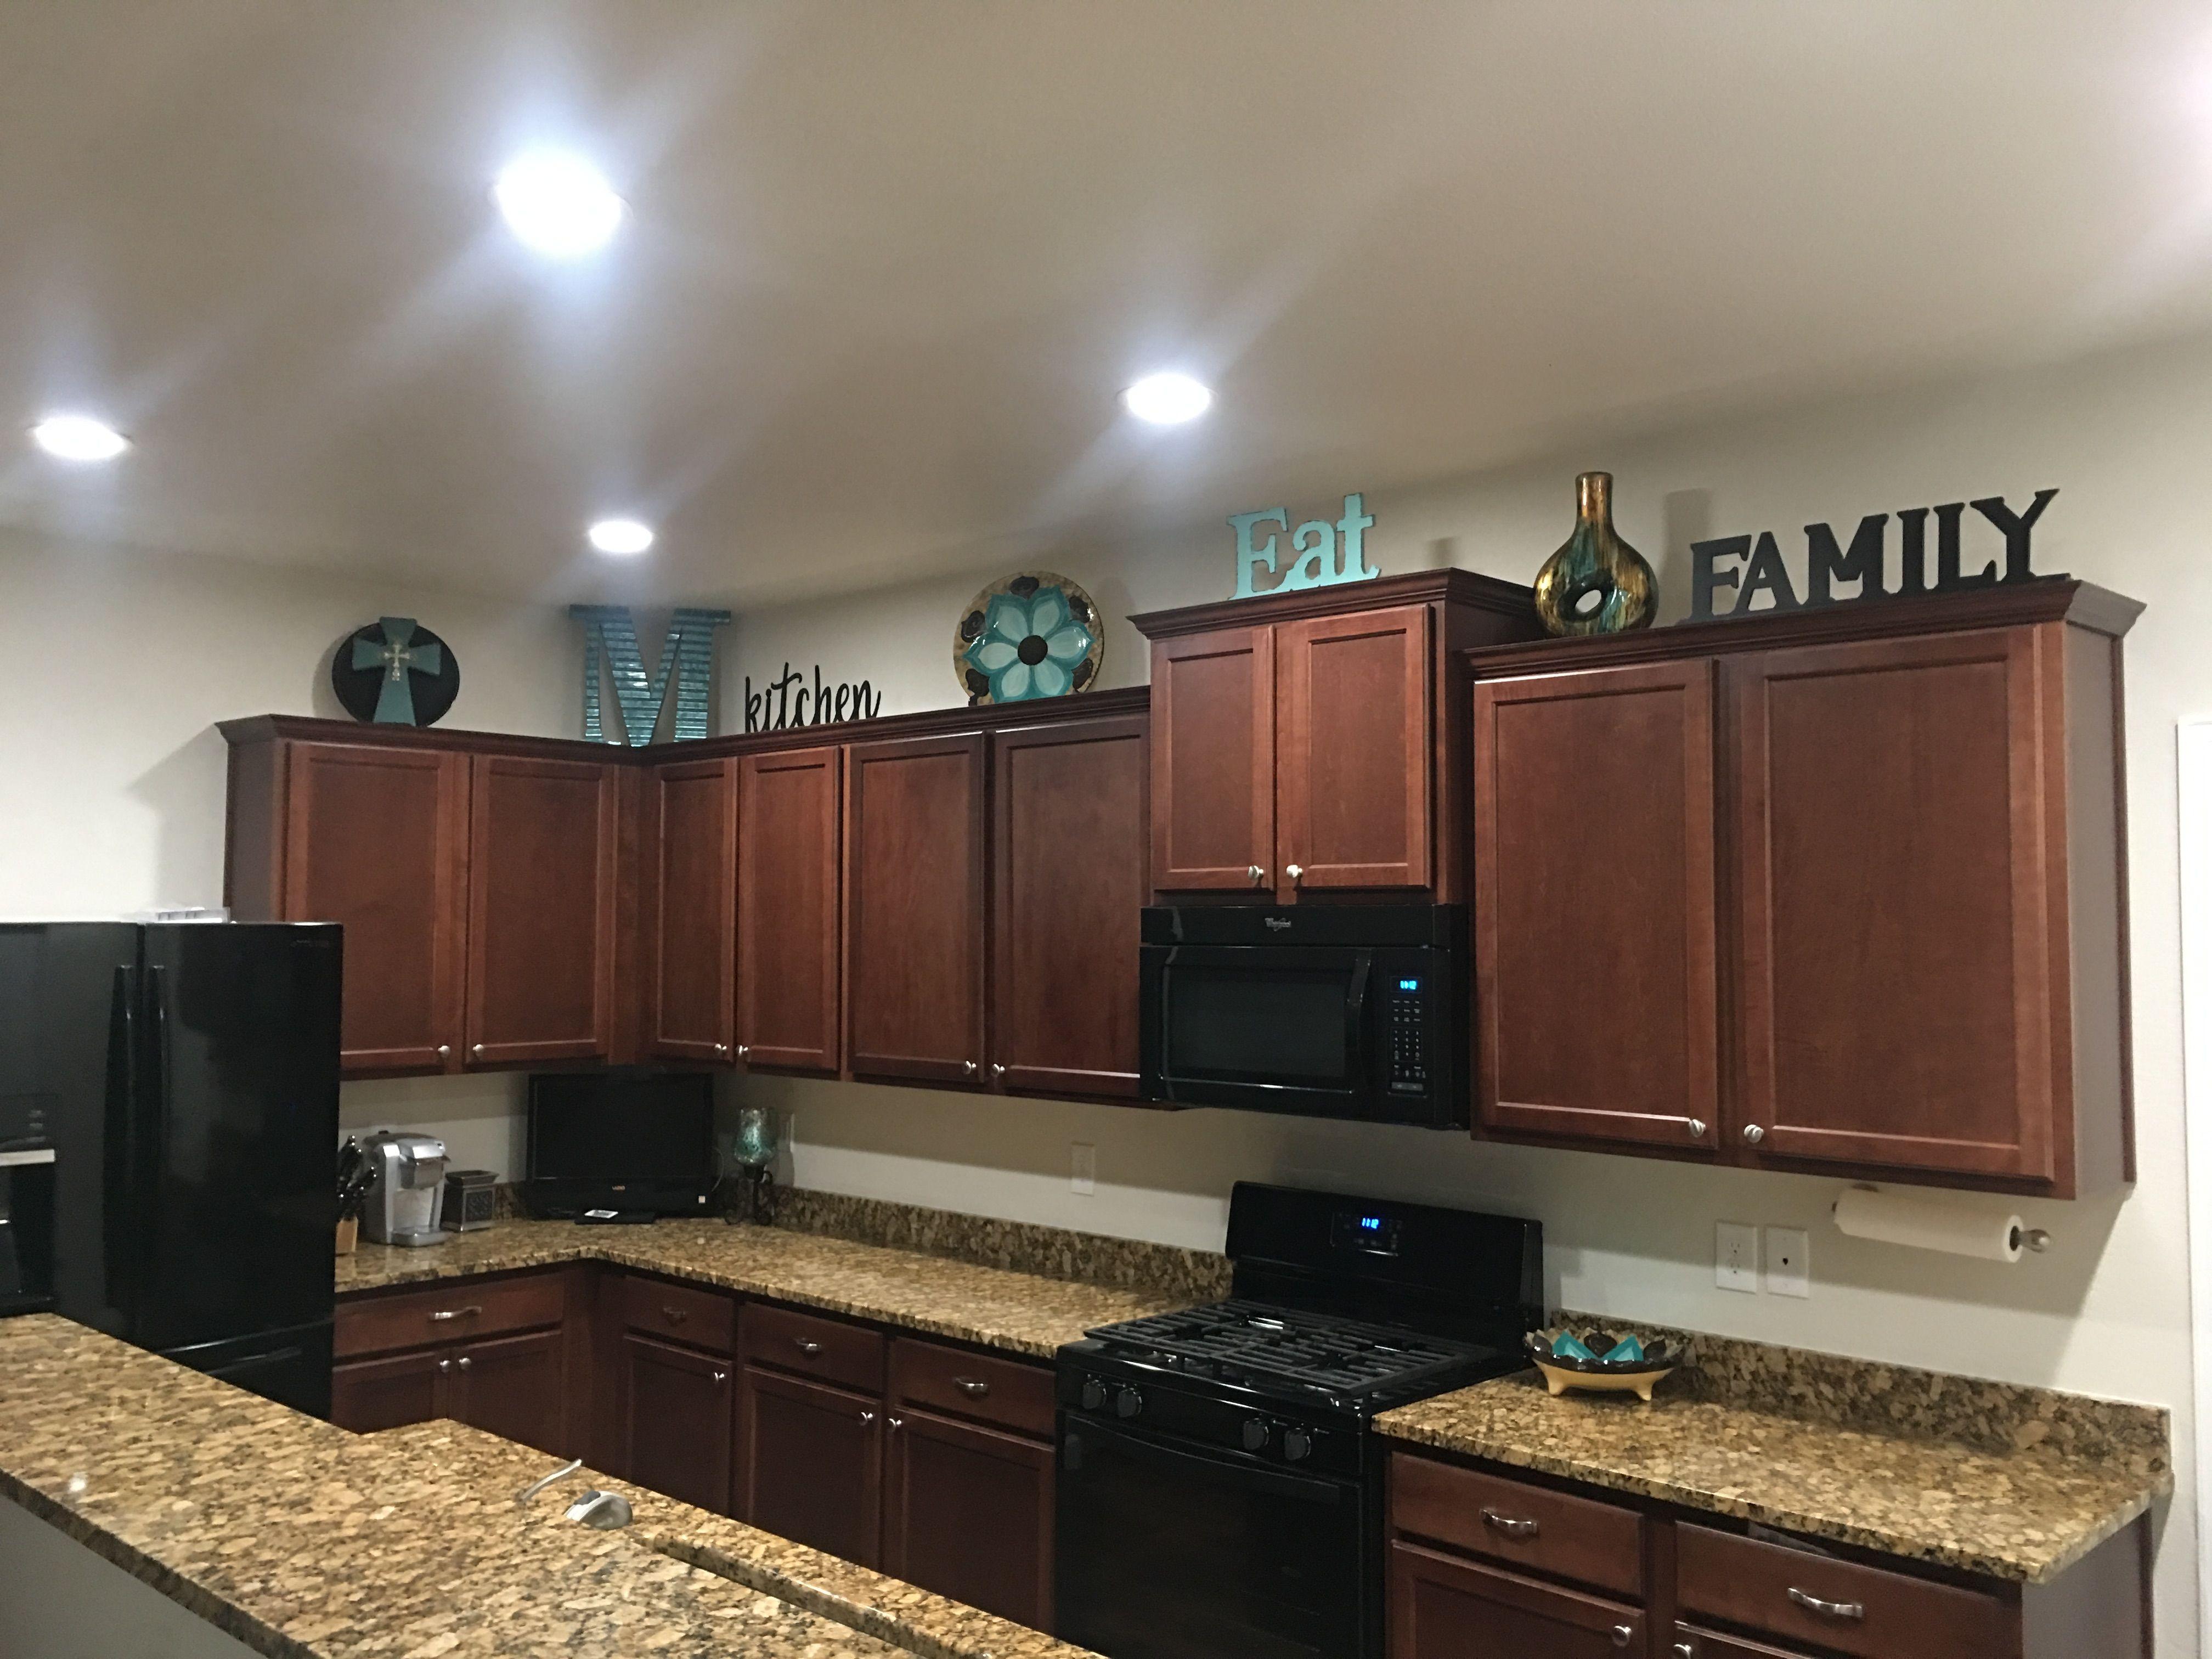 Above cabinet decor | New home ideas | Pinterest | Kitchen ...